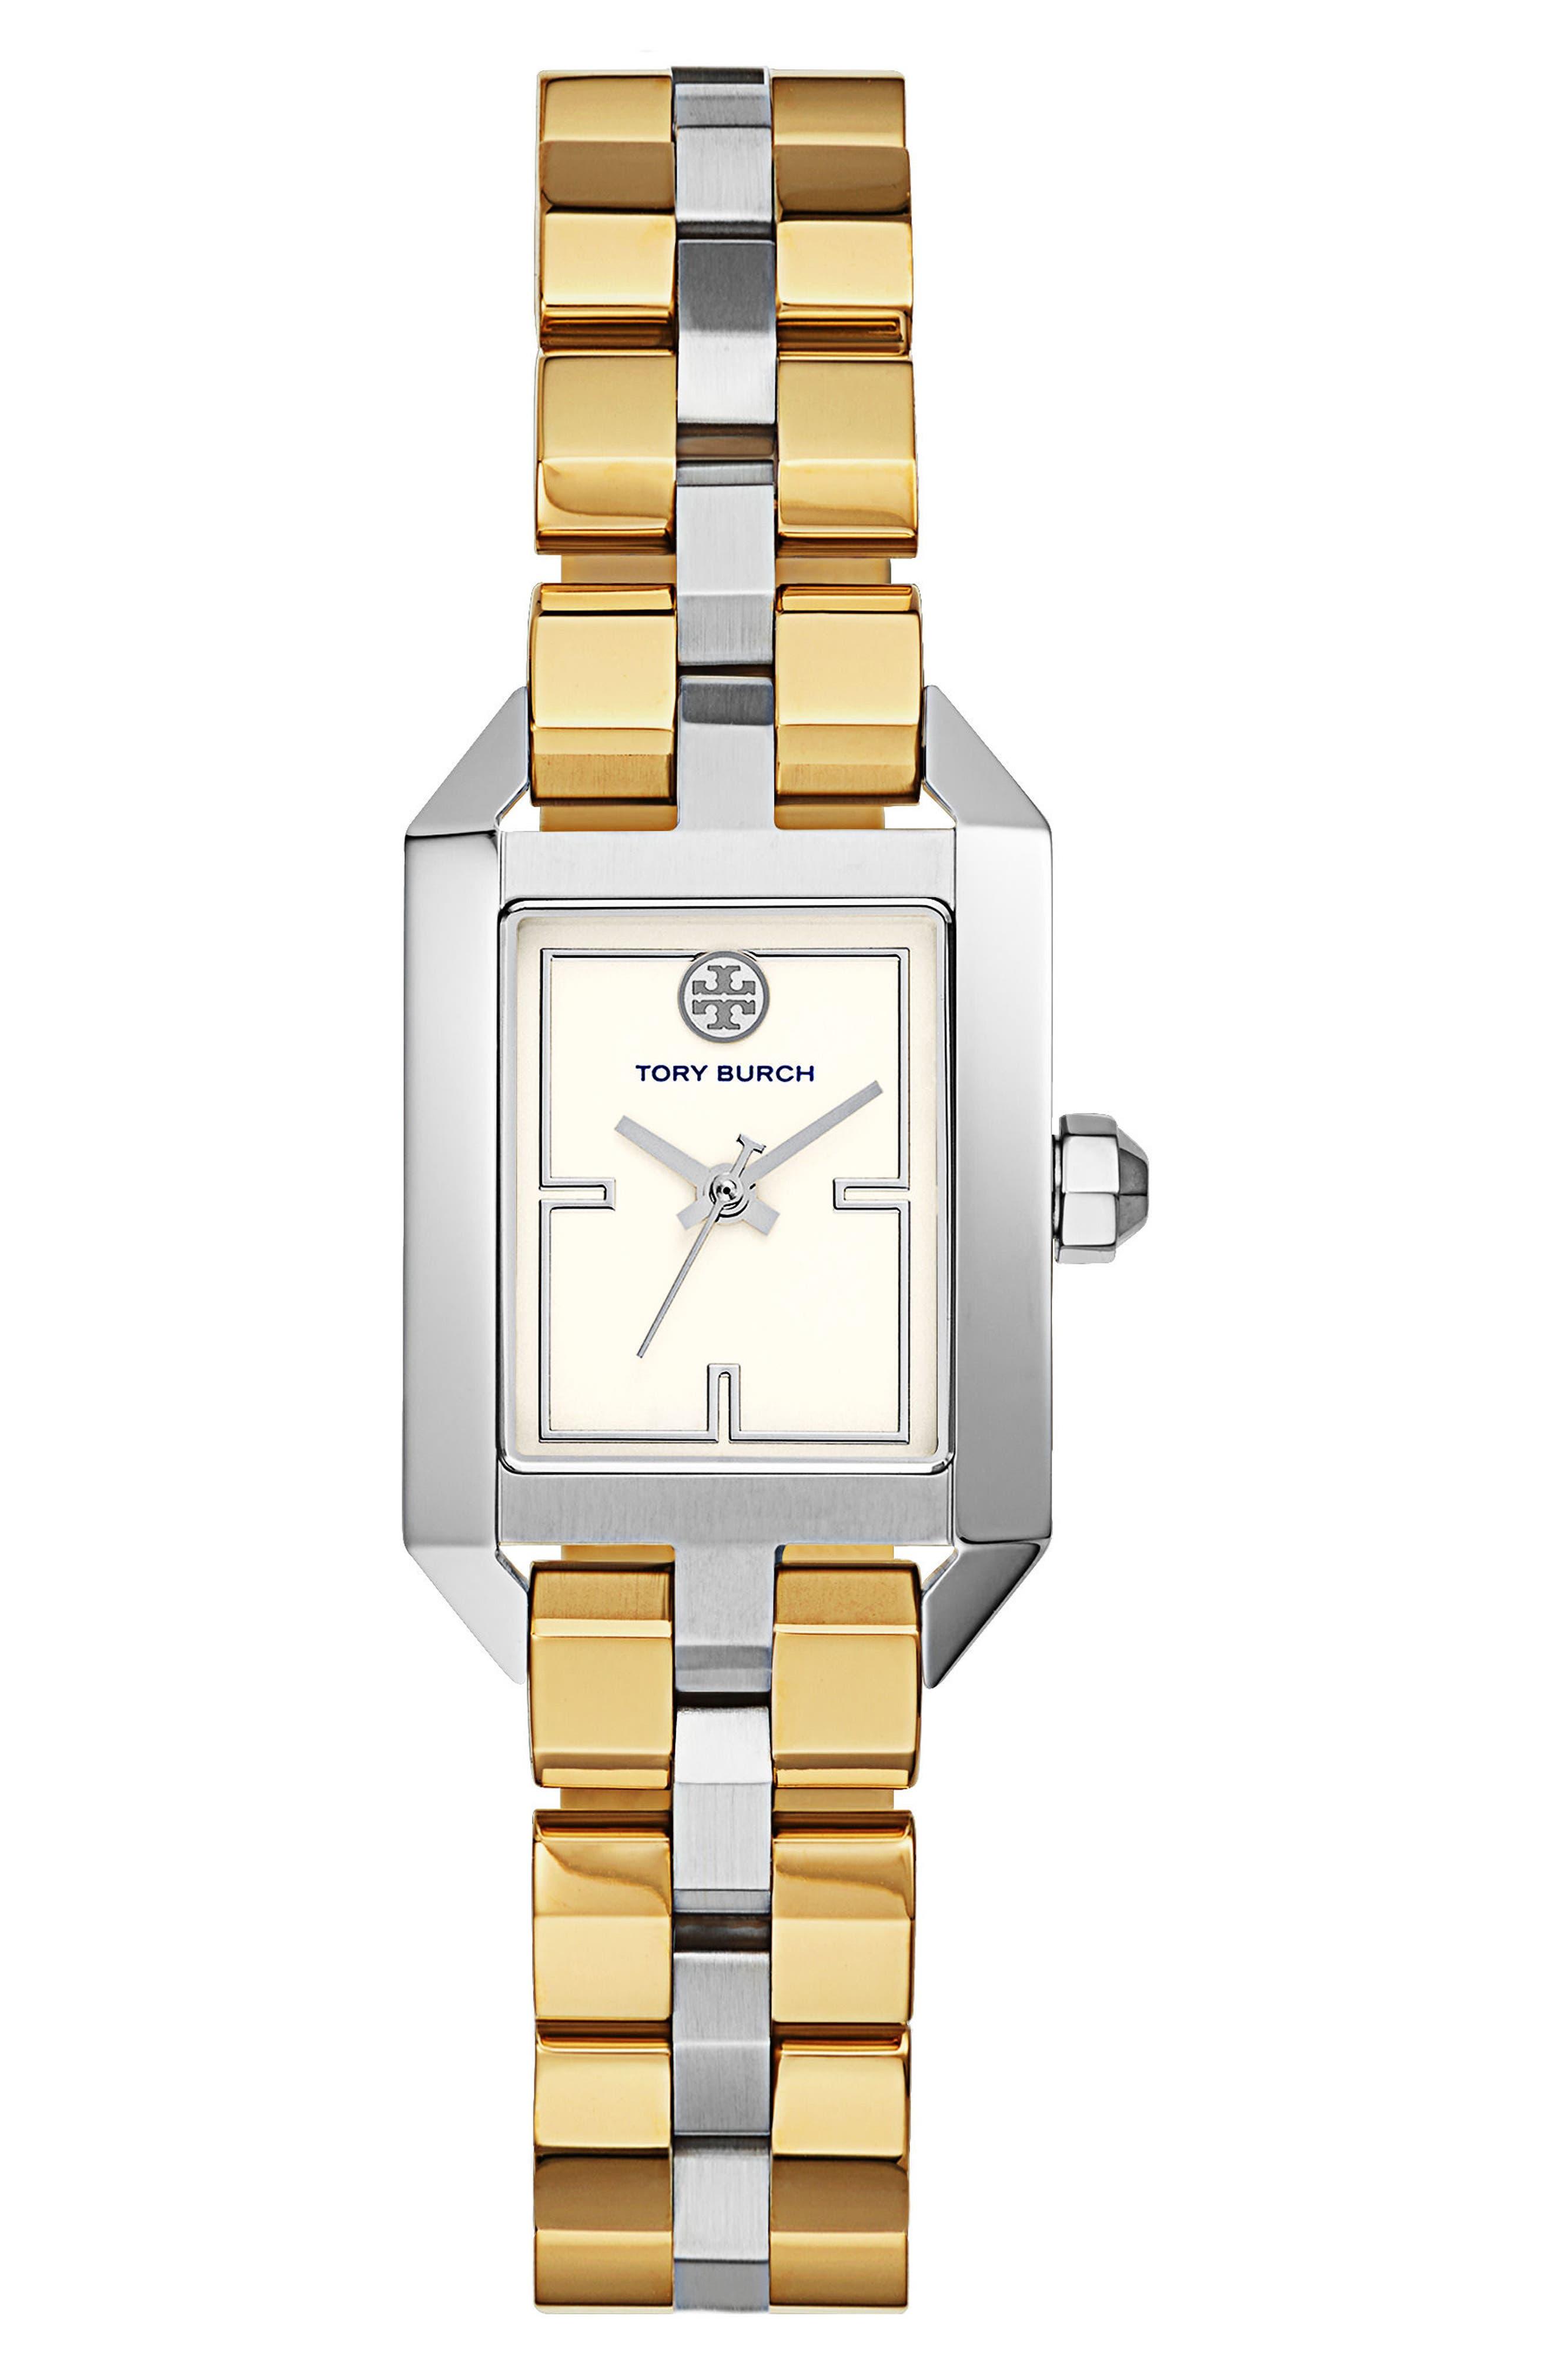 Main Image - Tory Burch Dalloway Bracelet Watch, 23mm x 36.5mm